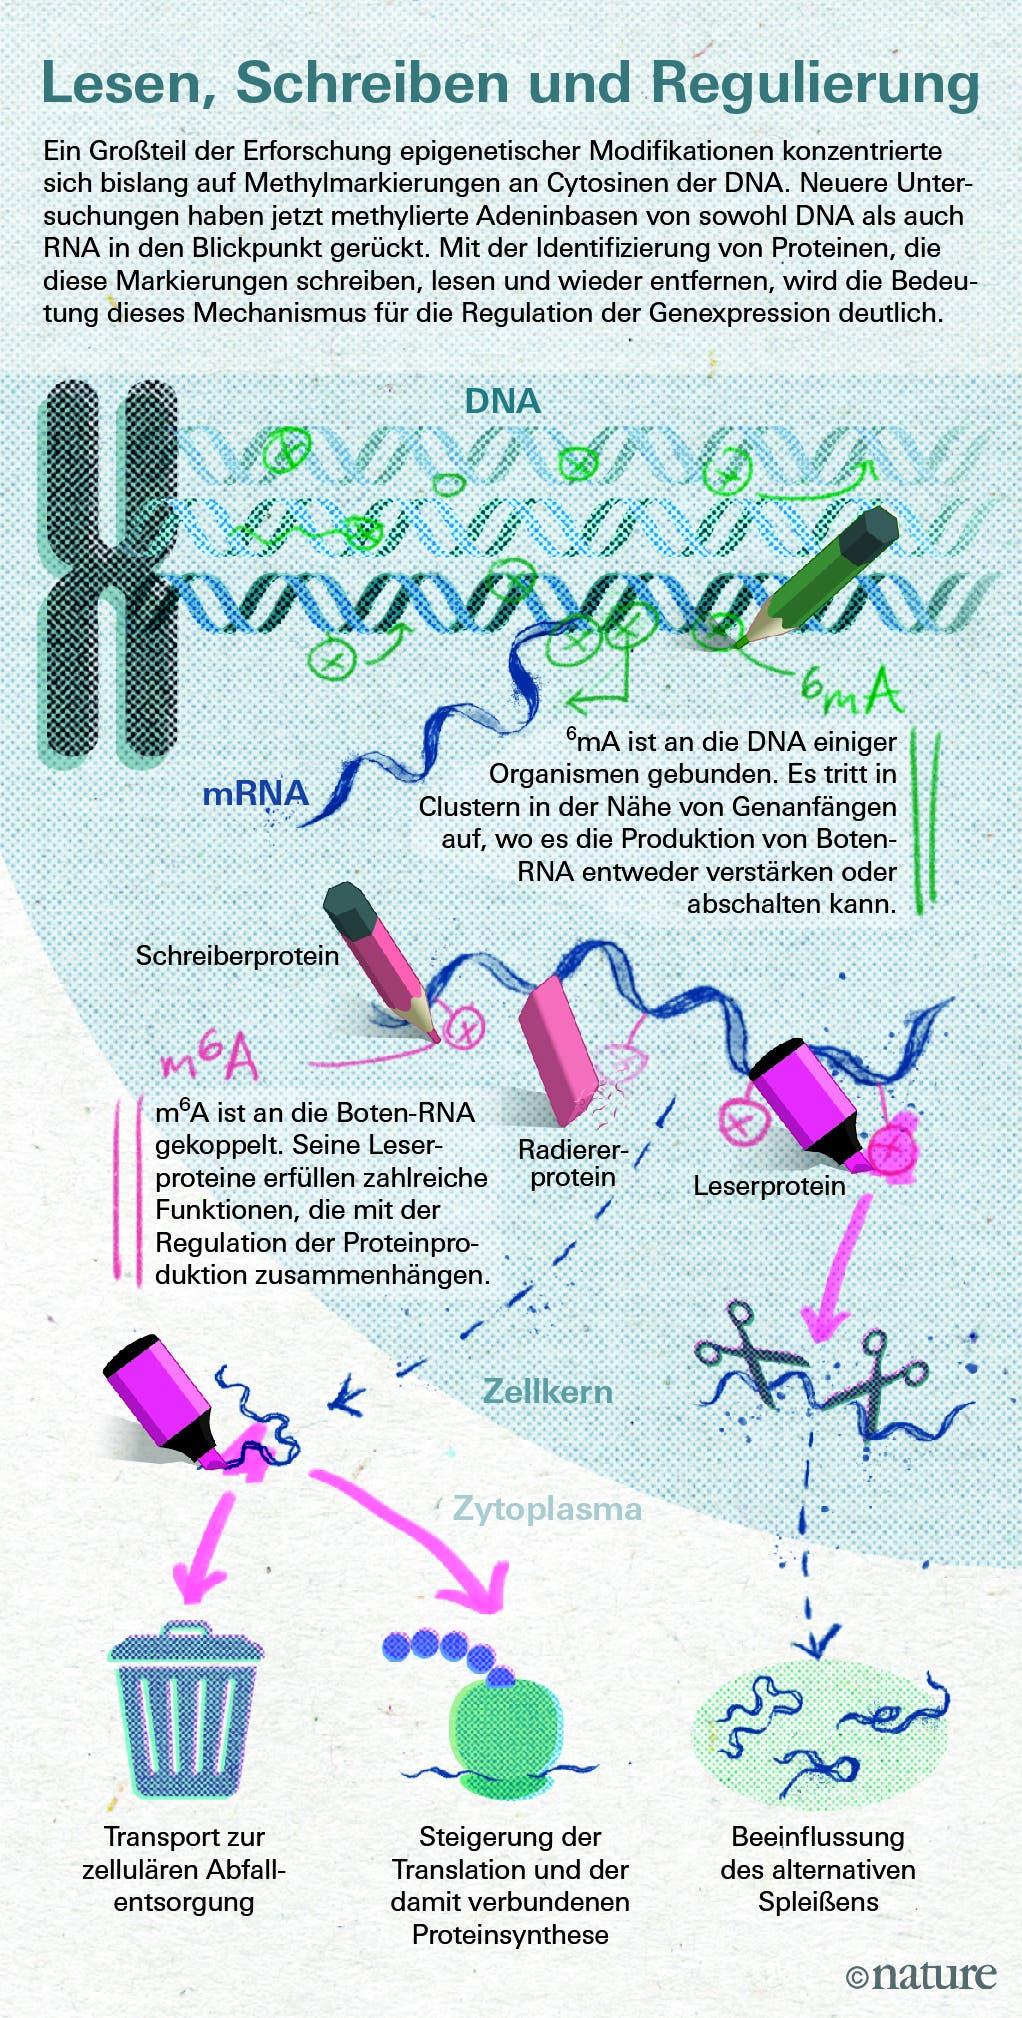 Neu entdeckte Mechanismen epigenetischer Modifikation